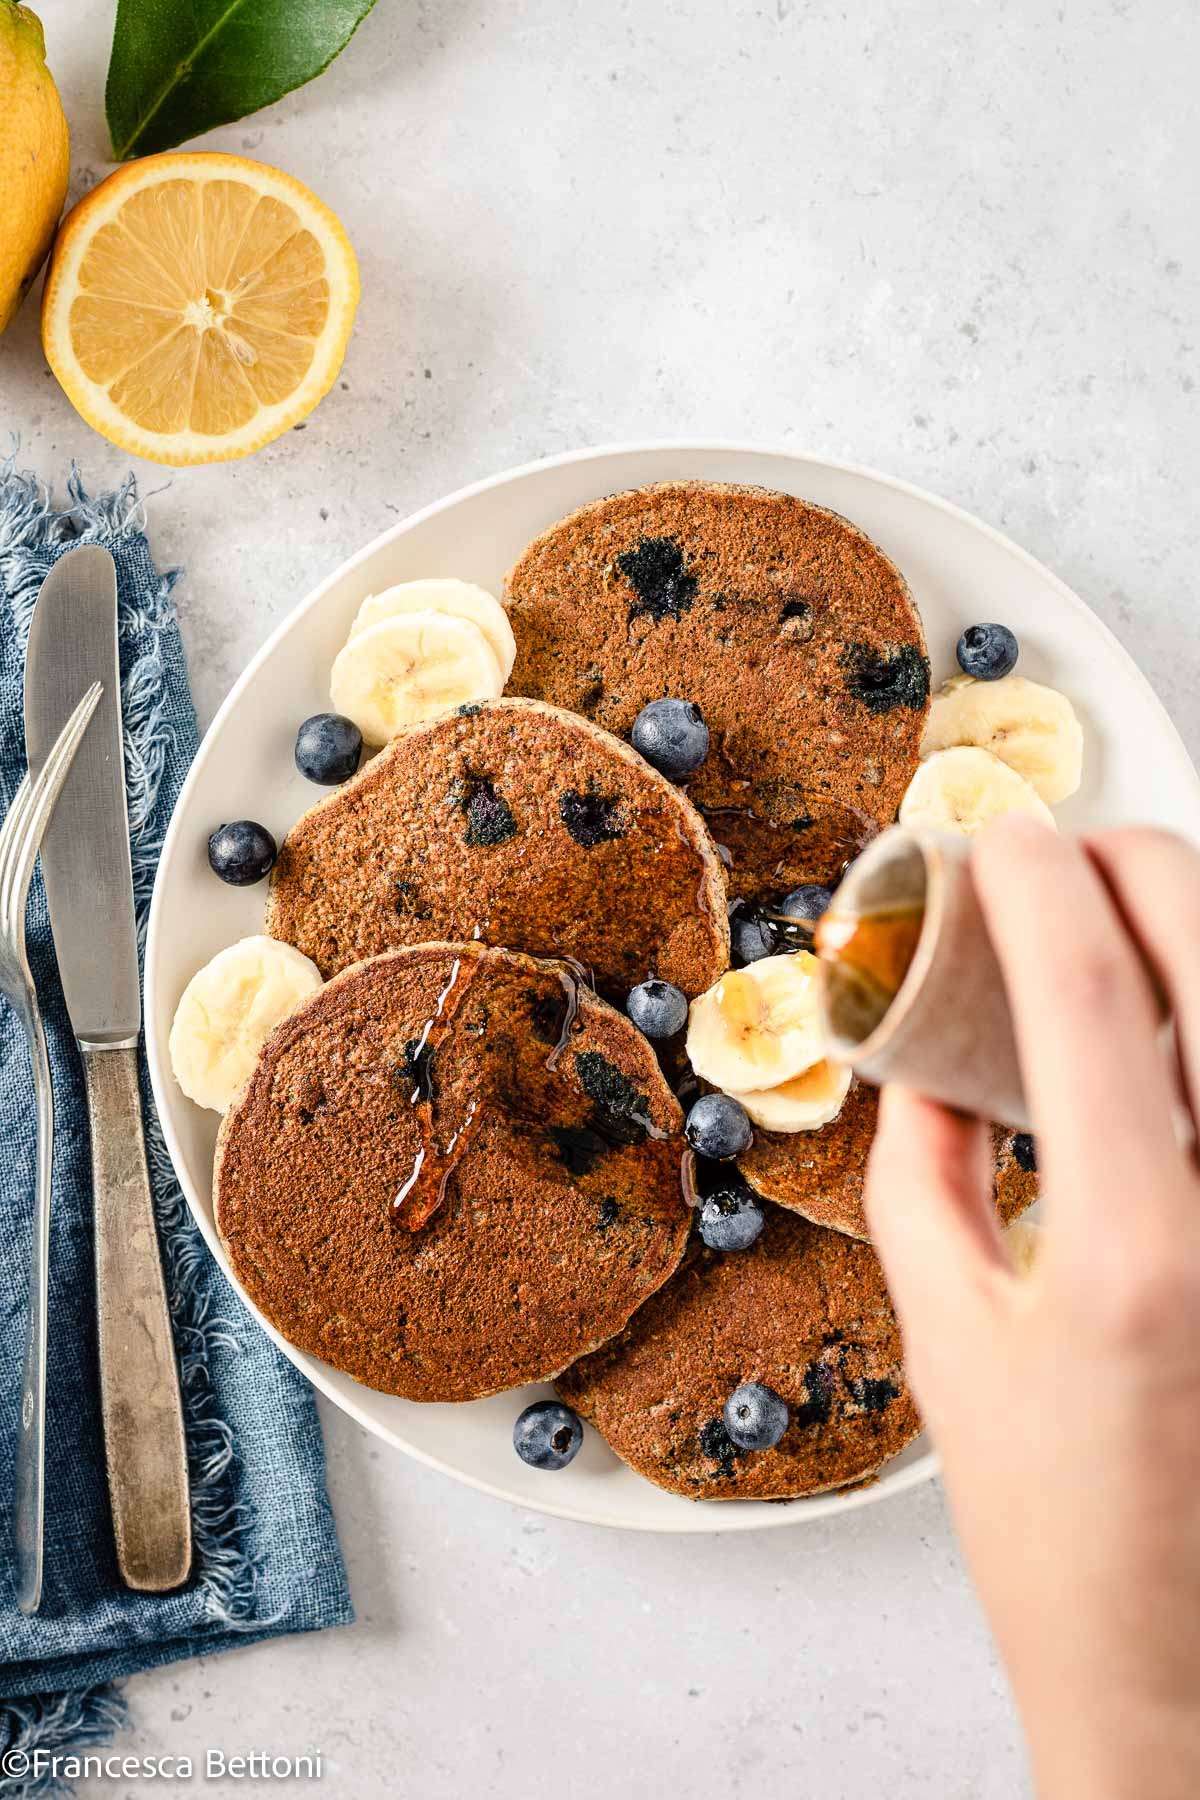 ricetta PANCAKES BANANA e MIRTILLI SENZA GLIUTINE senza uova gluten-free Vegan Banana Blueberry Pancakes recipe